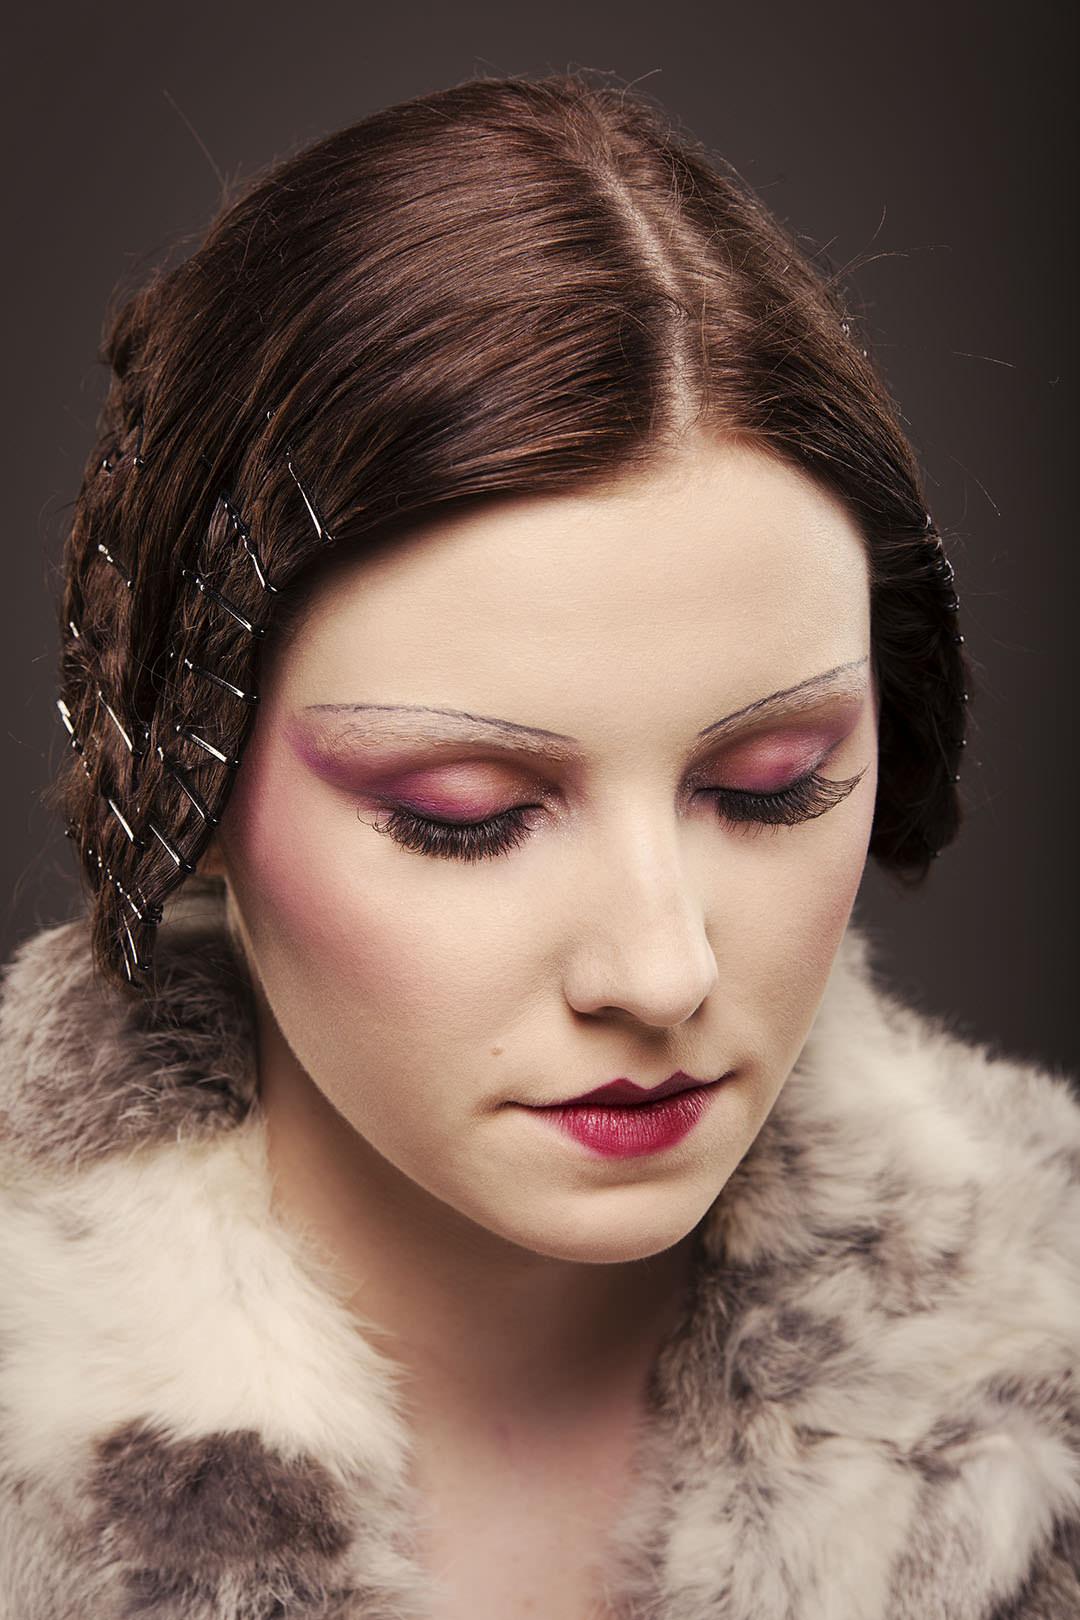 Magdalena_Dziadkowiak-Stefaniak_make_up_04